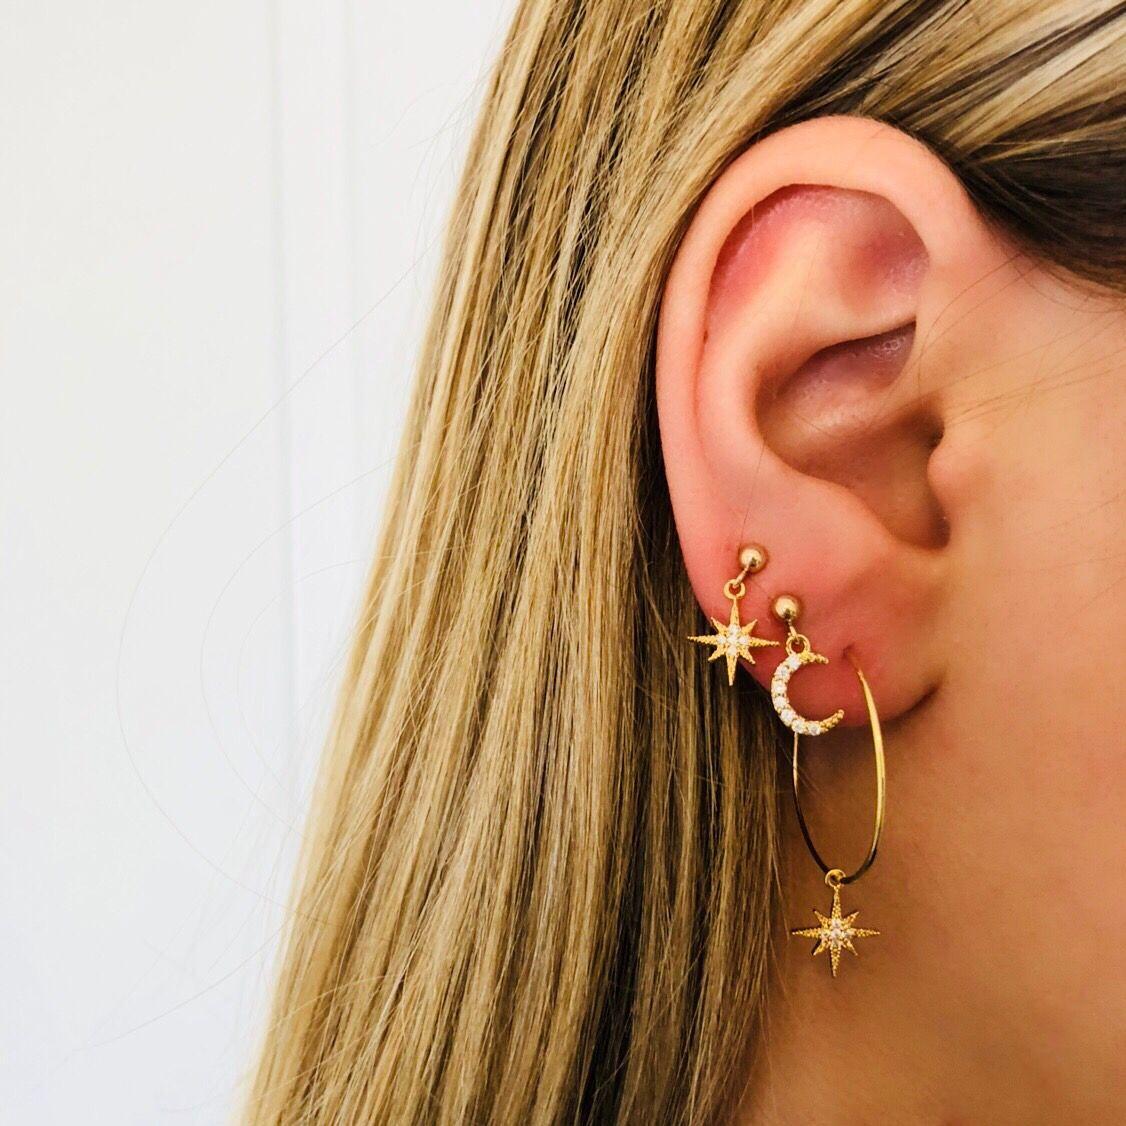 Piercing ideas for girls  P I N T E R E S T   roseburst   j e w e l l e r y  Pinterest